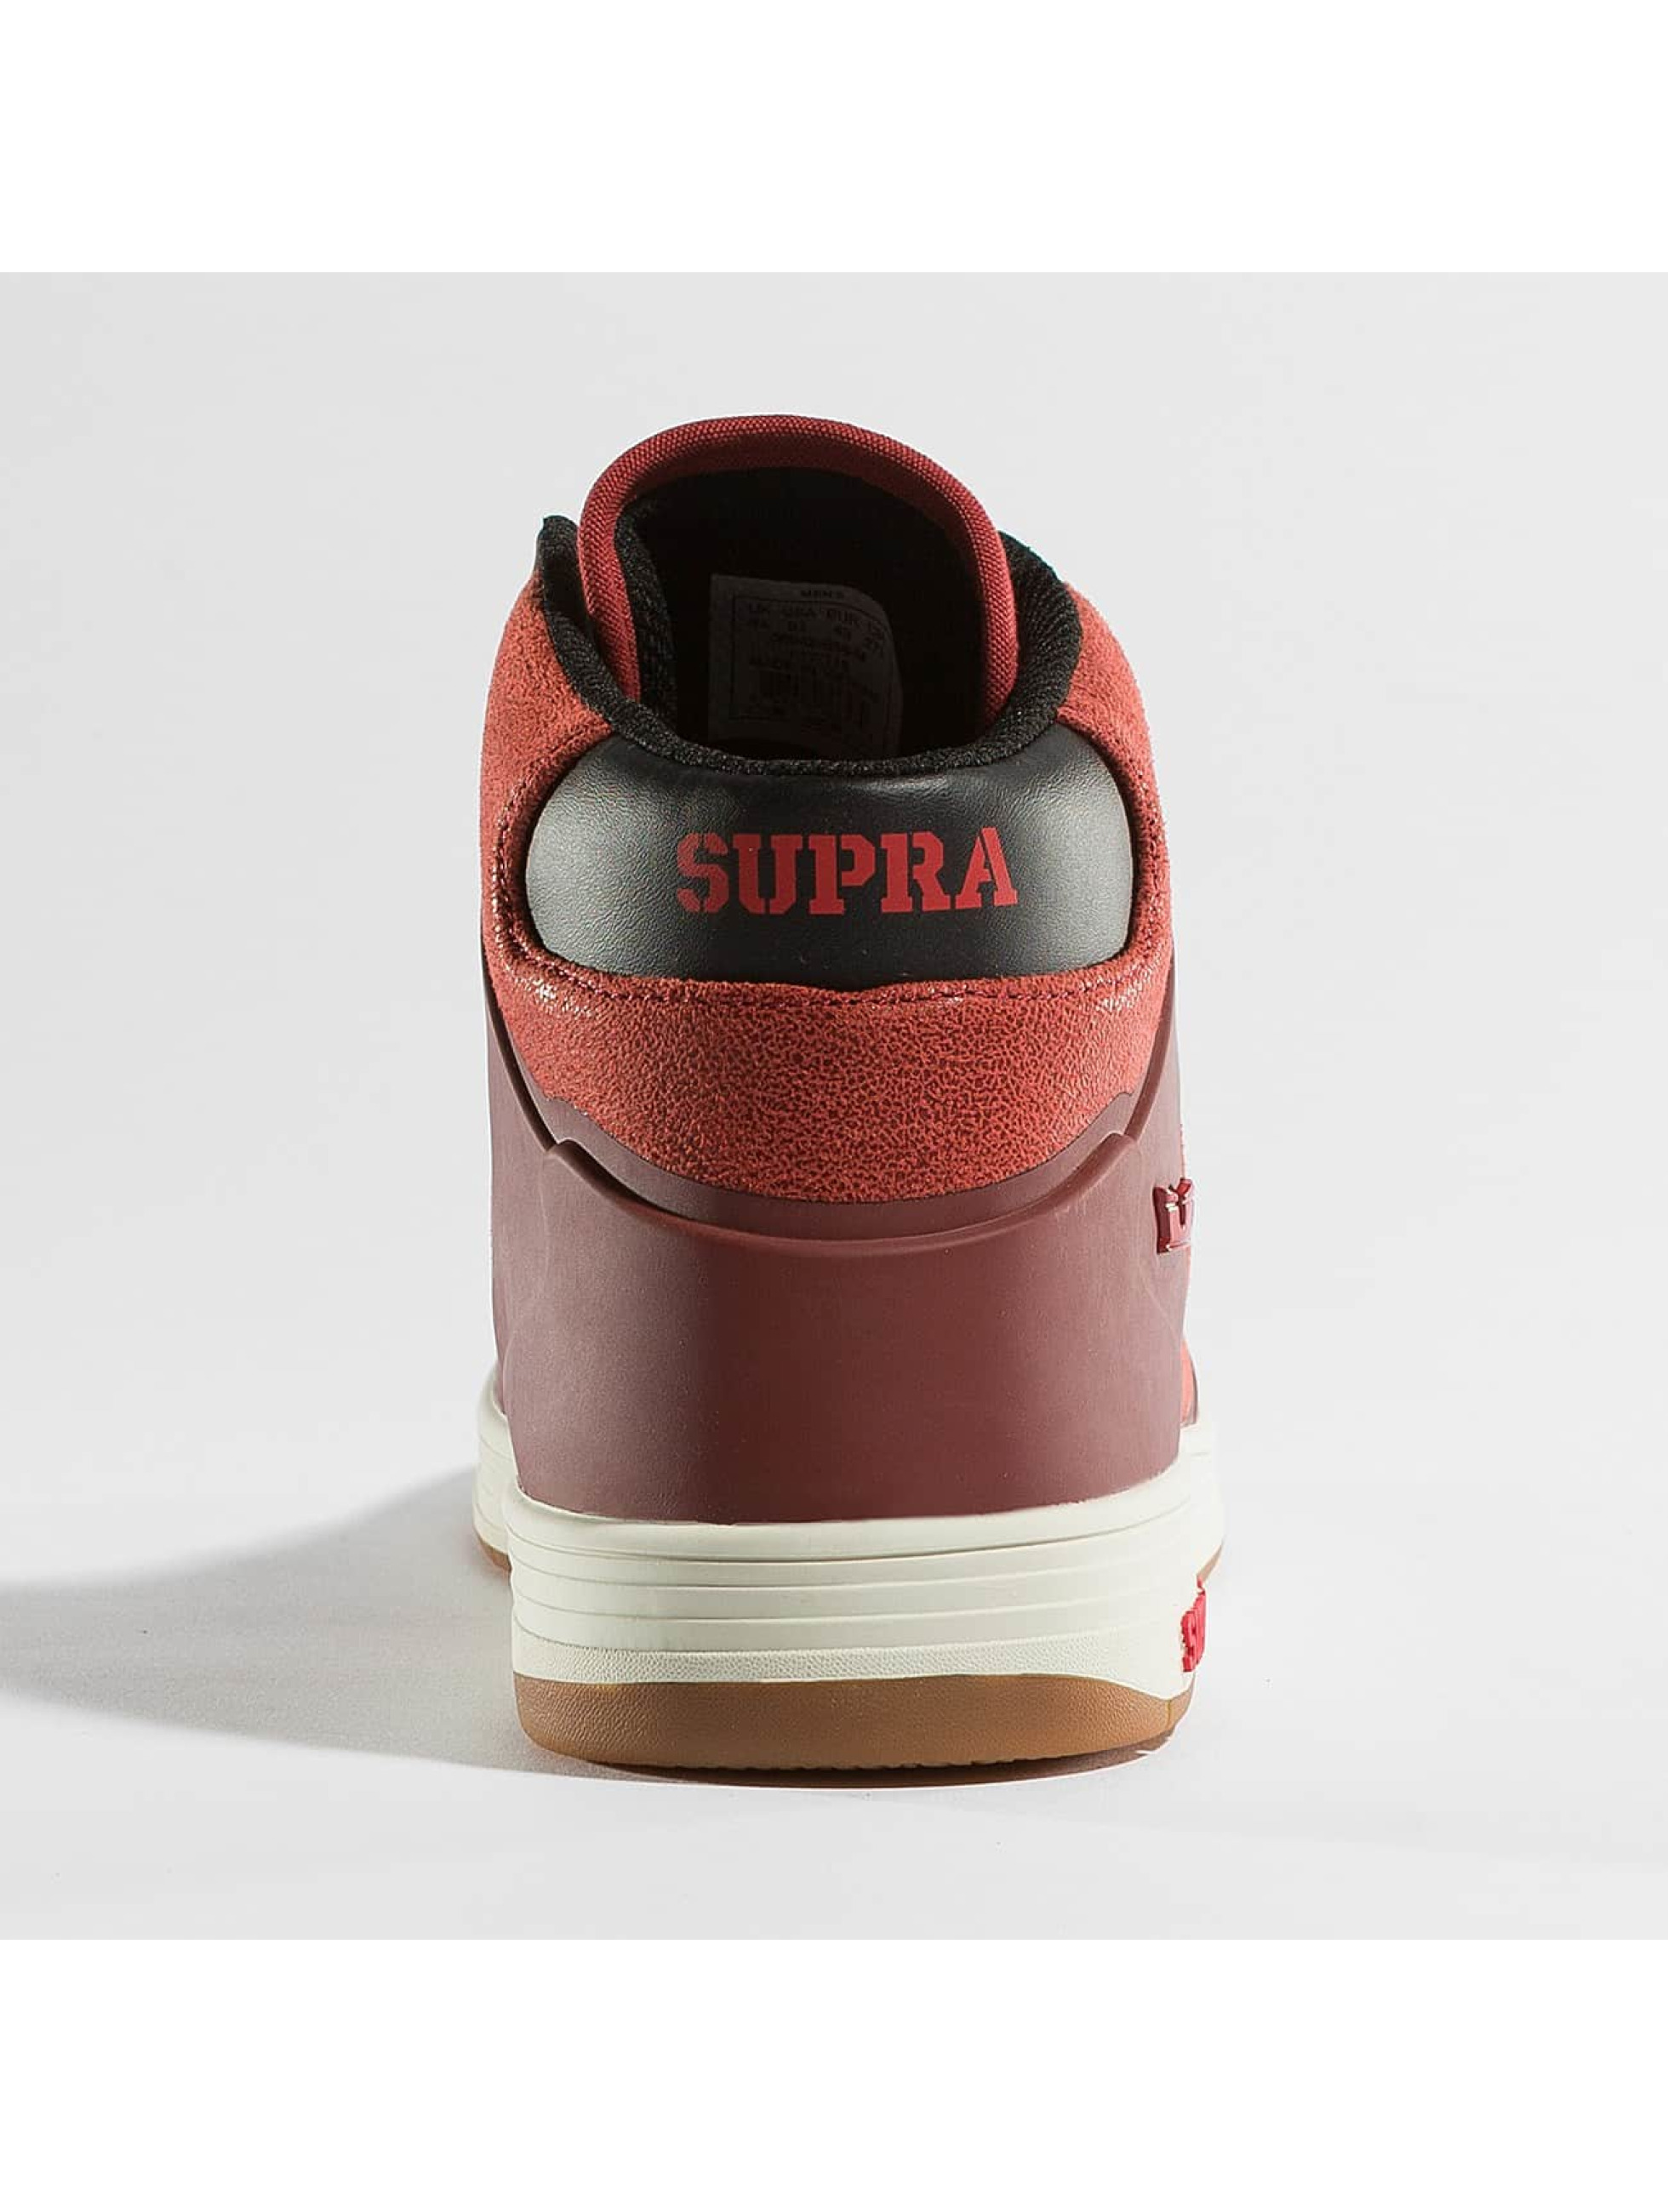 Supra Sneakers Vaider 2.0 colored